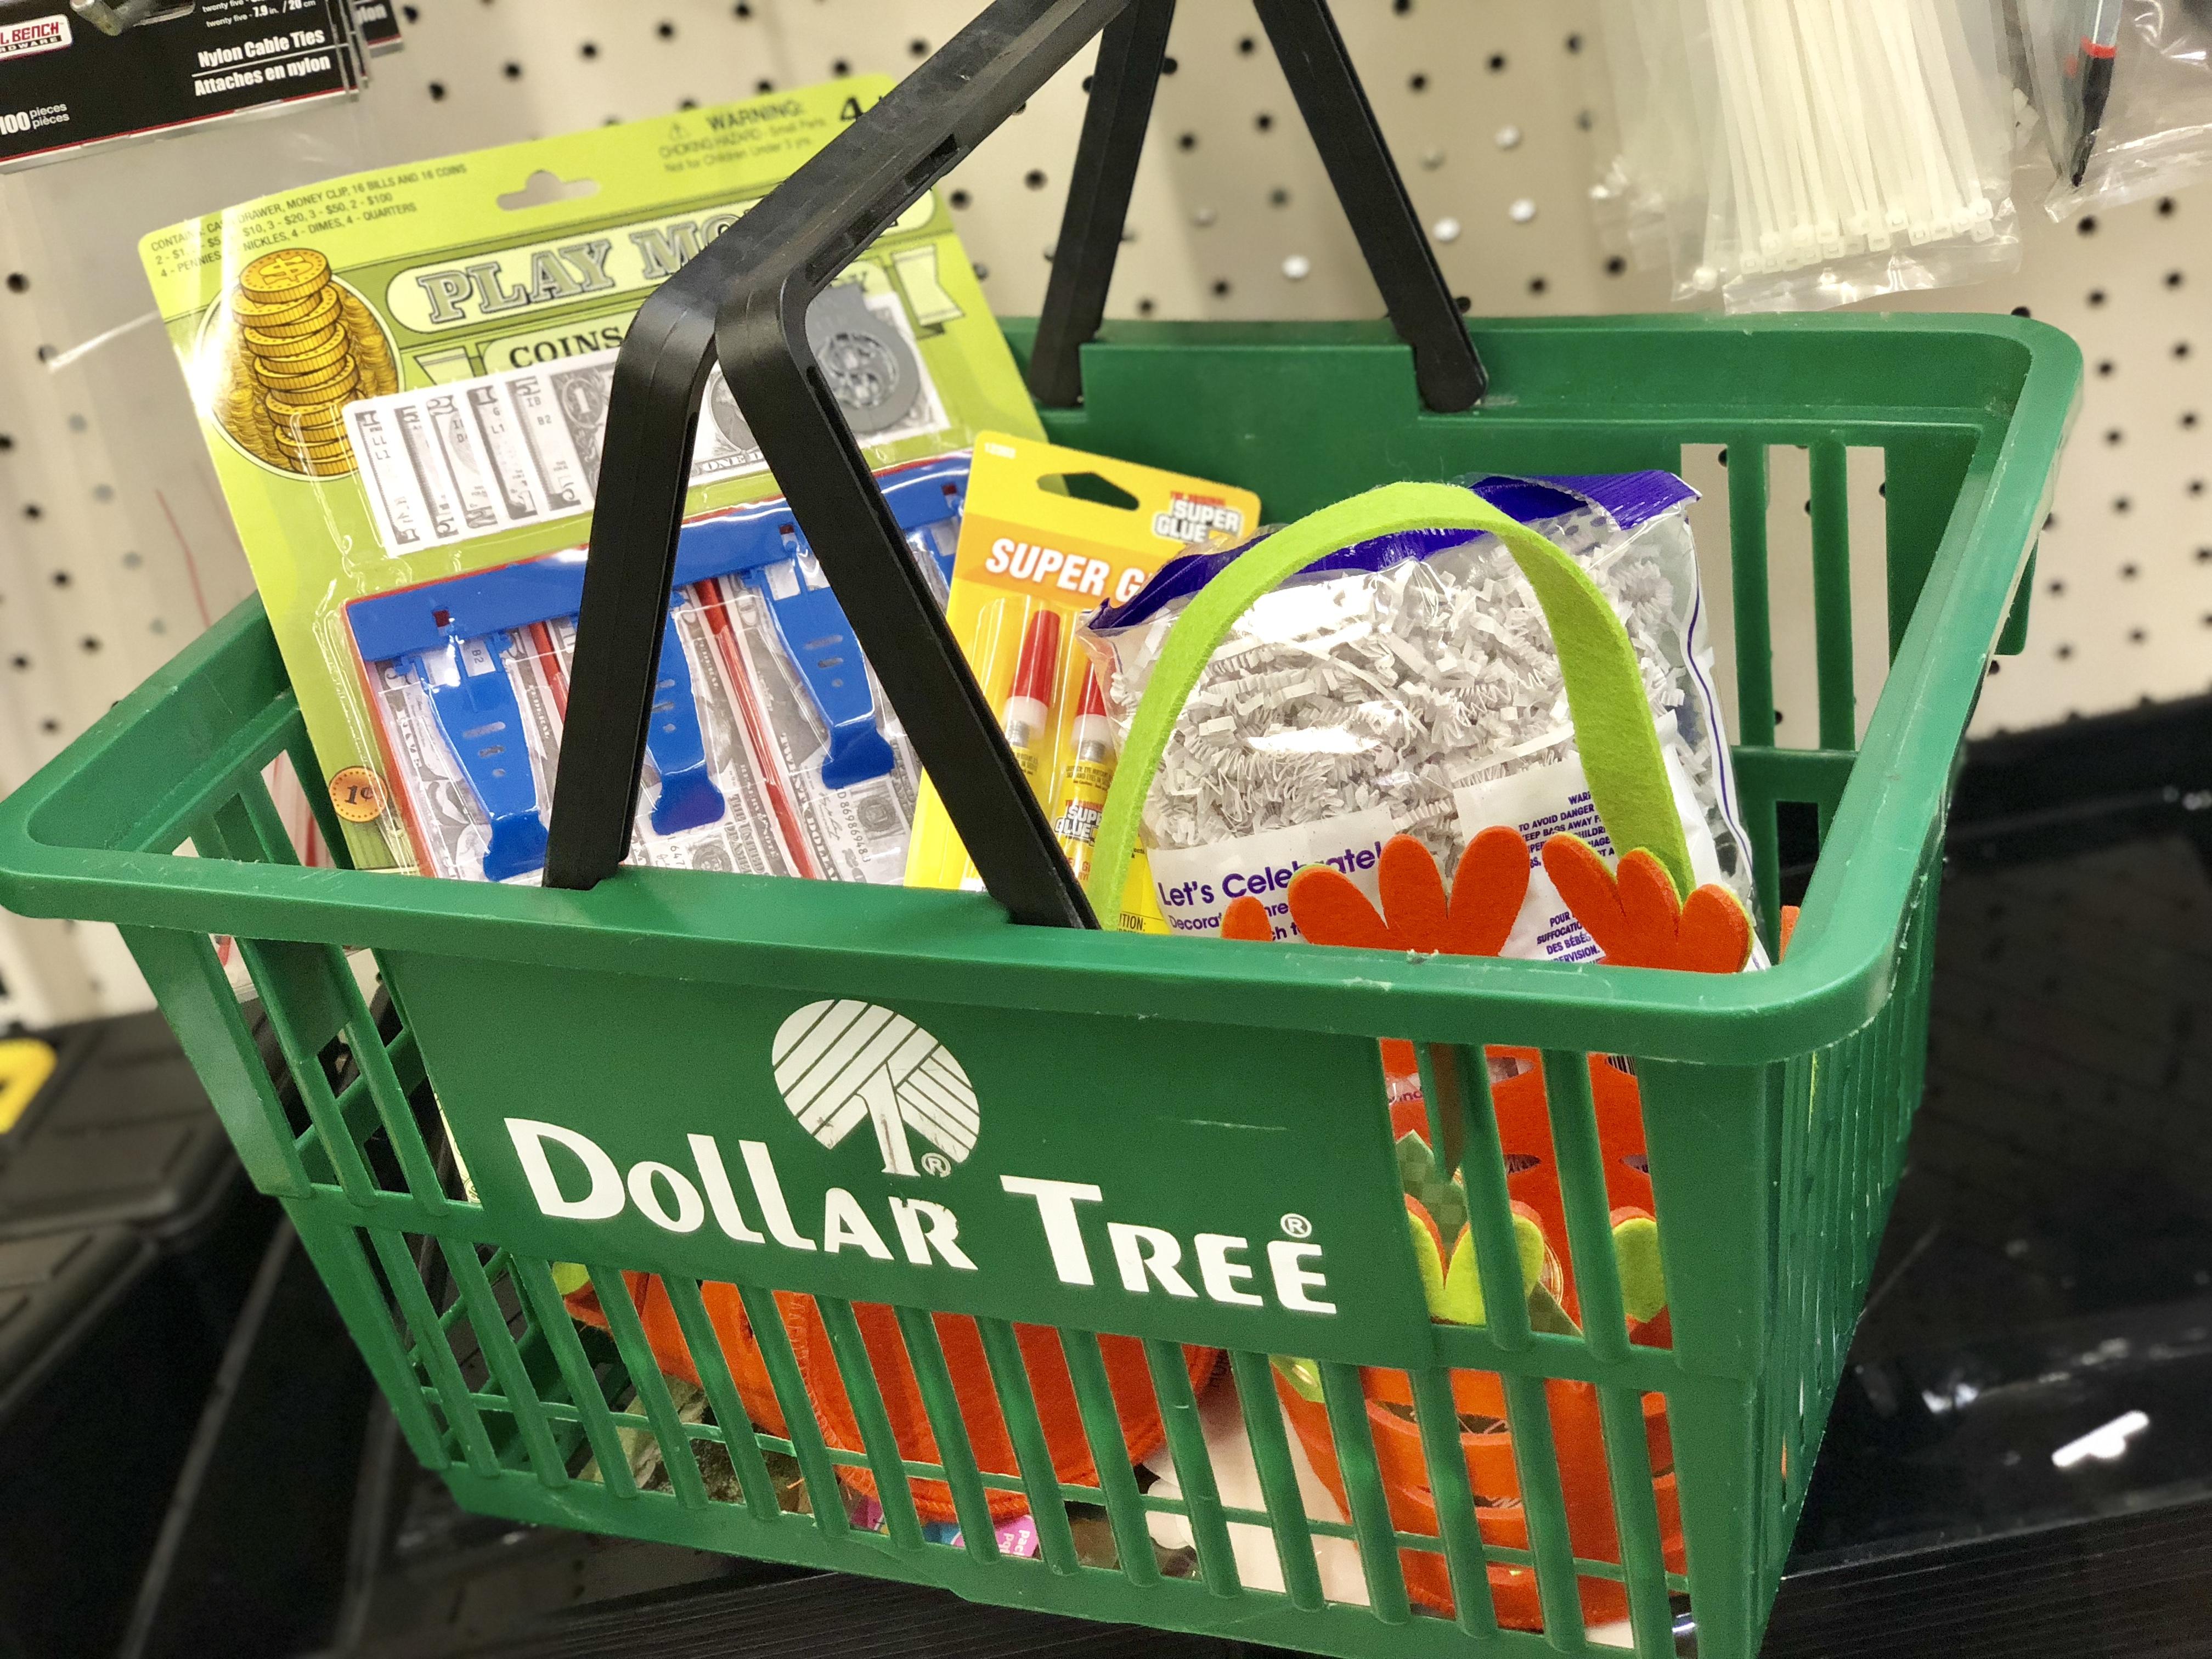 basket on a conveyor belt with items inside